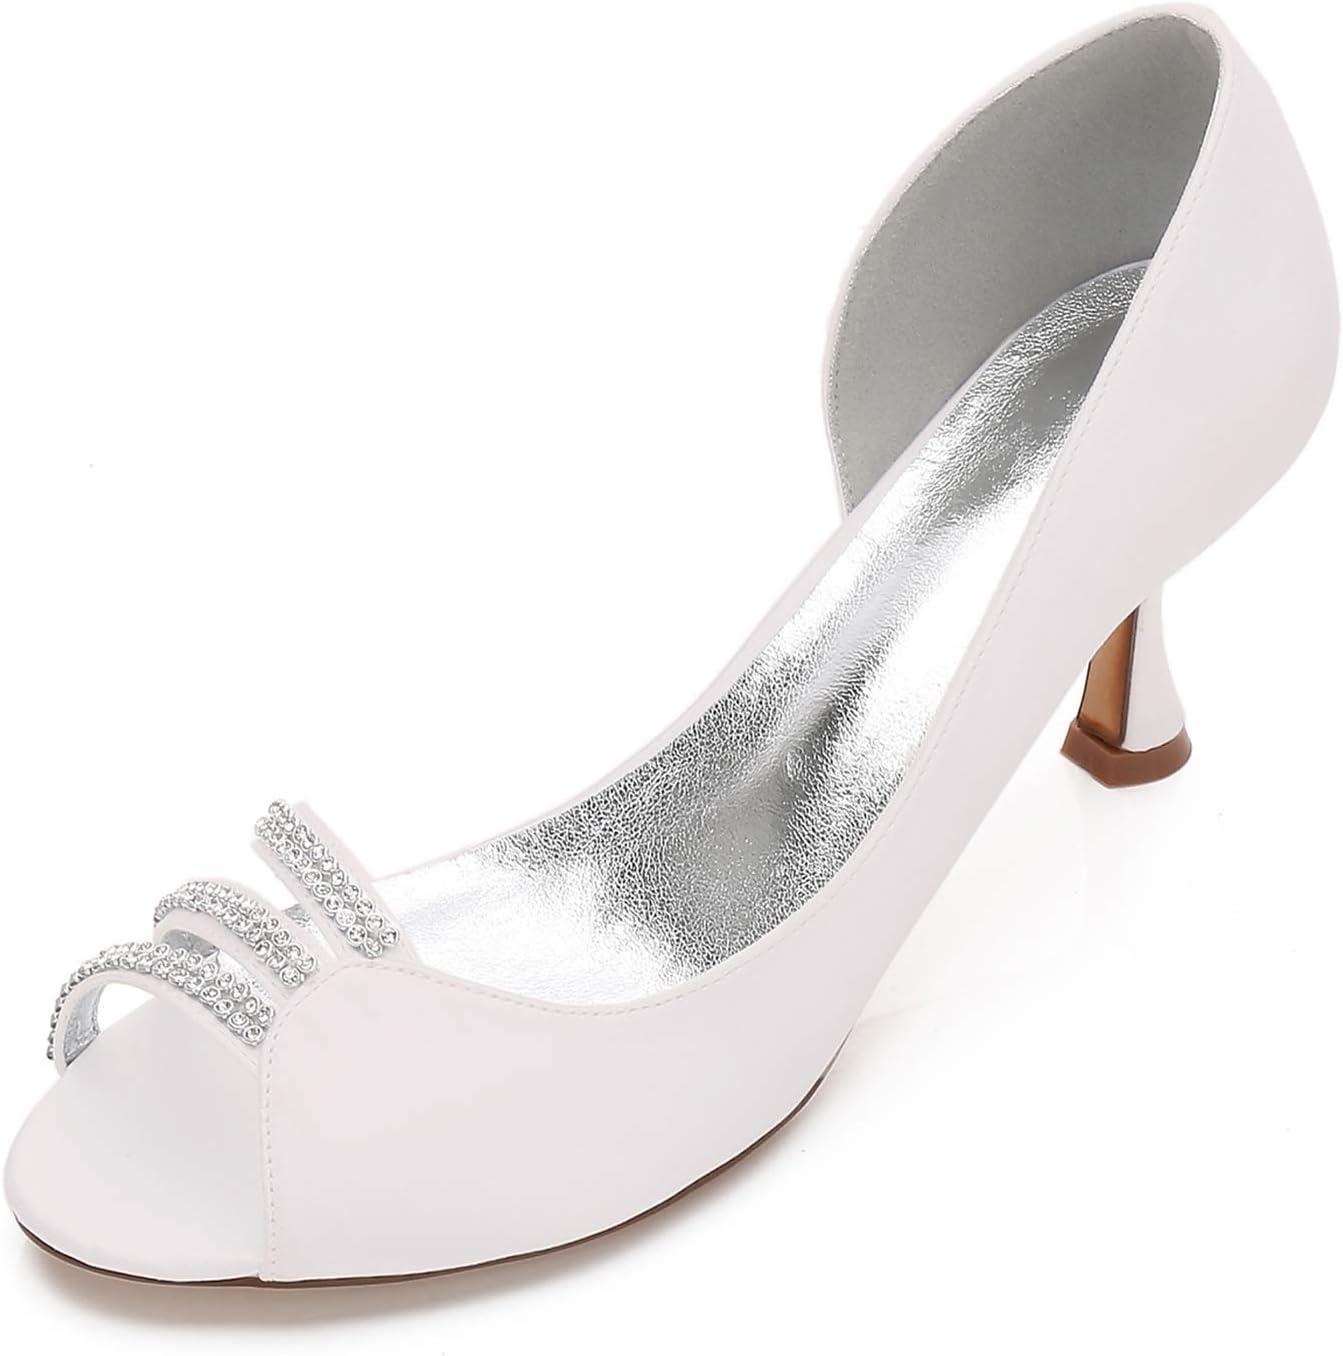 COMFASH 17061-32 Women Mid Heels Satin D'orsay Peep Toe Dress Pumps Rhinestiones Wedding Evening Court Shoes Ivory